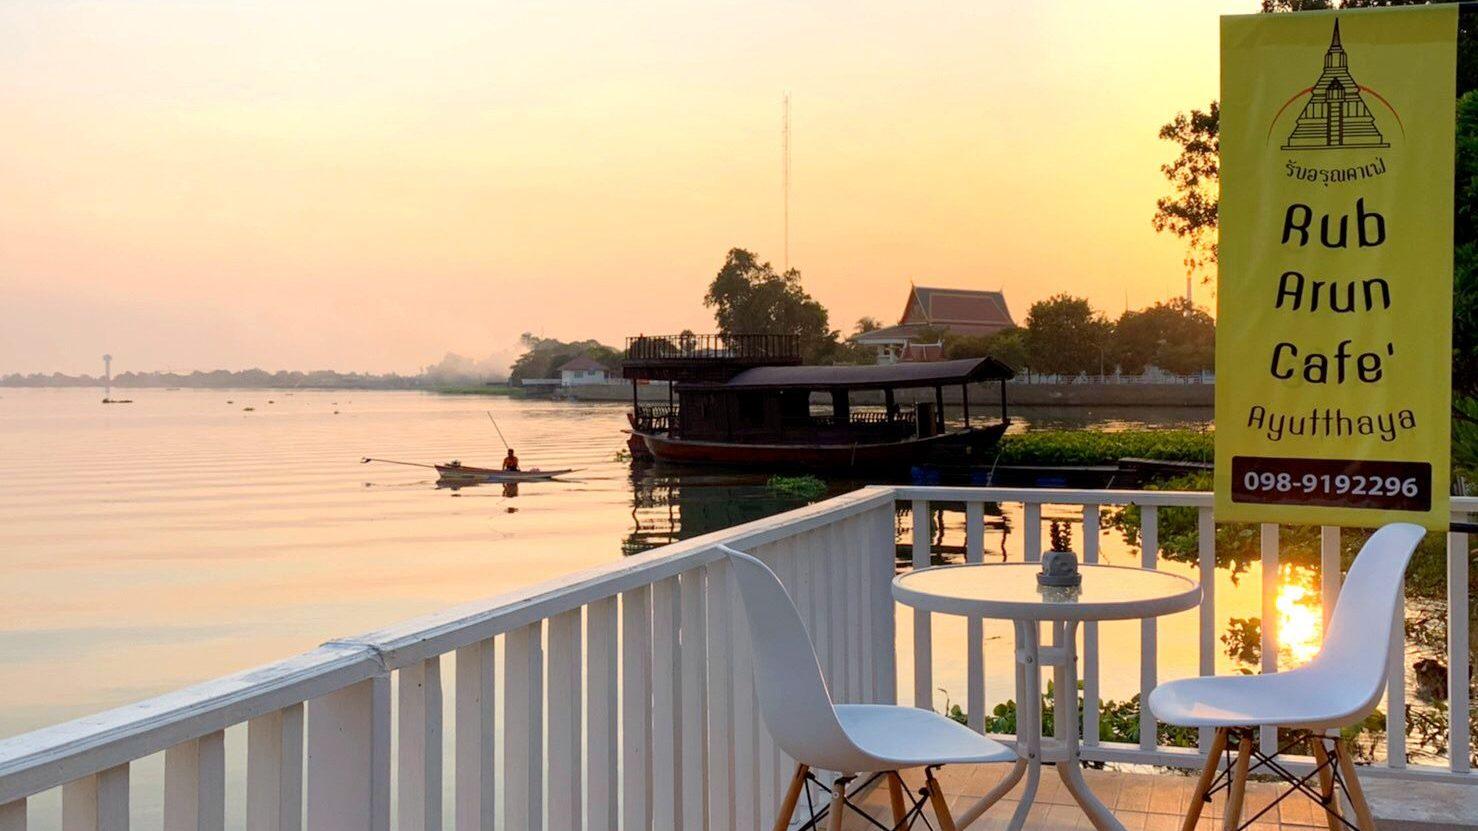 Rub-Arun-Cafe' Ayutthaya 003